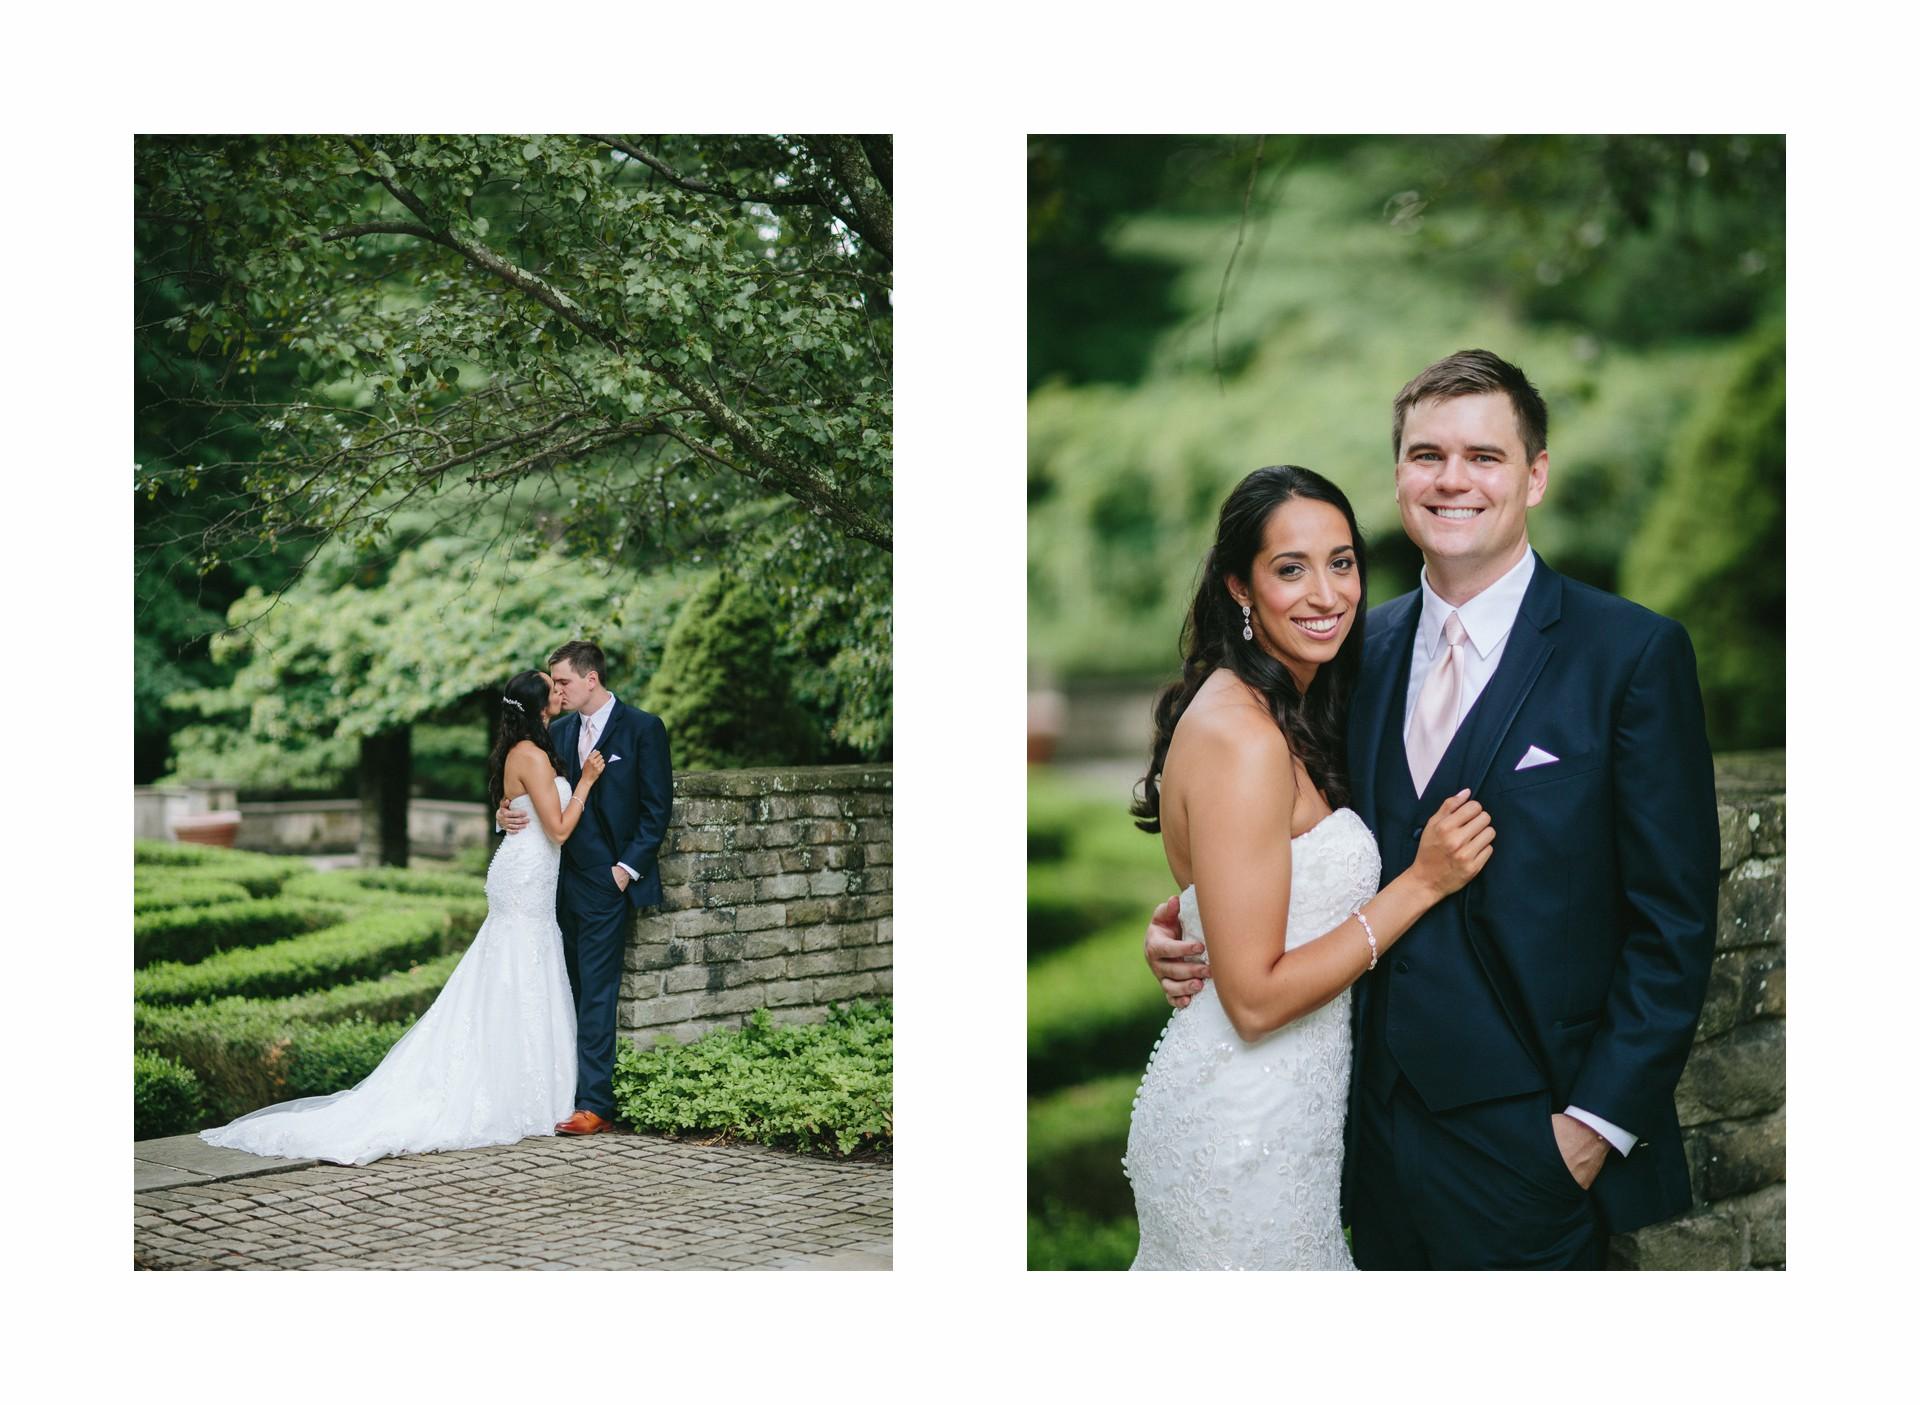 Bolton House Wedding Photographer in Beachwood 33.jpg